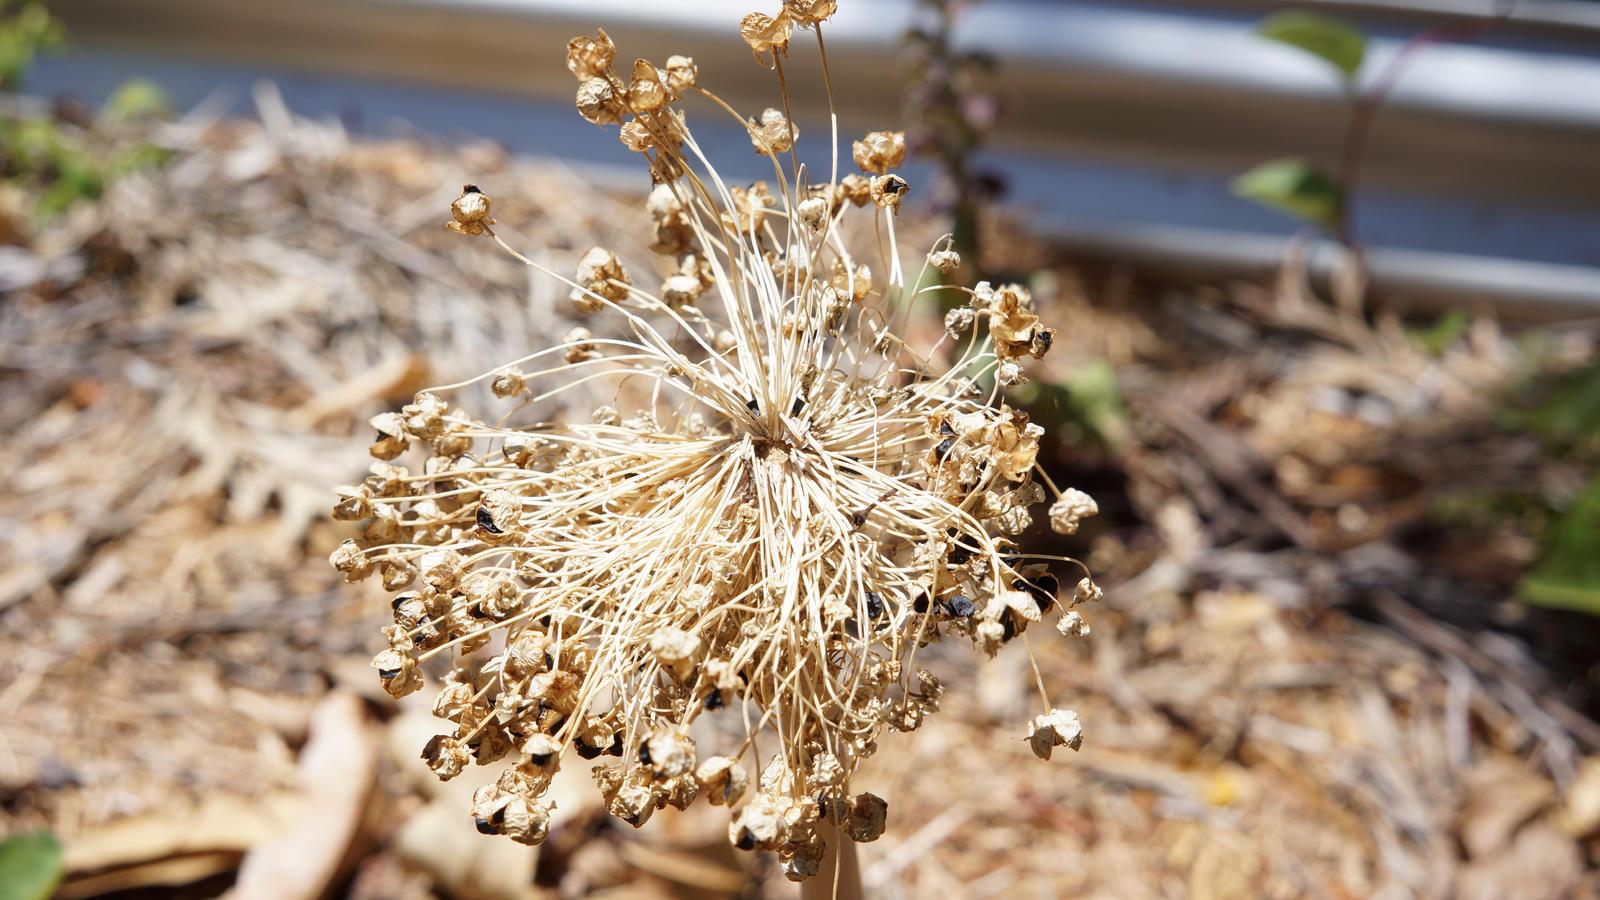 Dead Flower/Thing by manuelo-pro